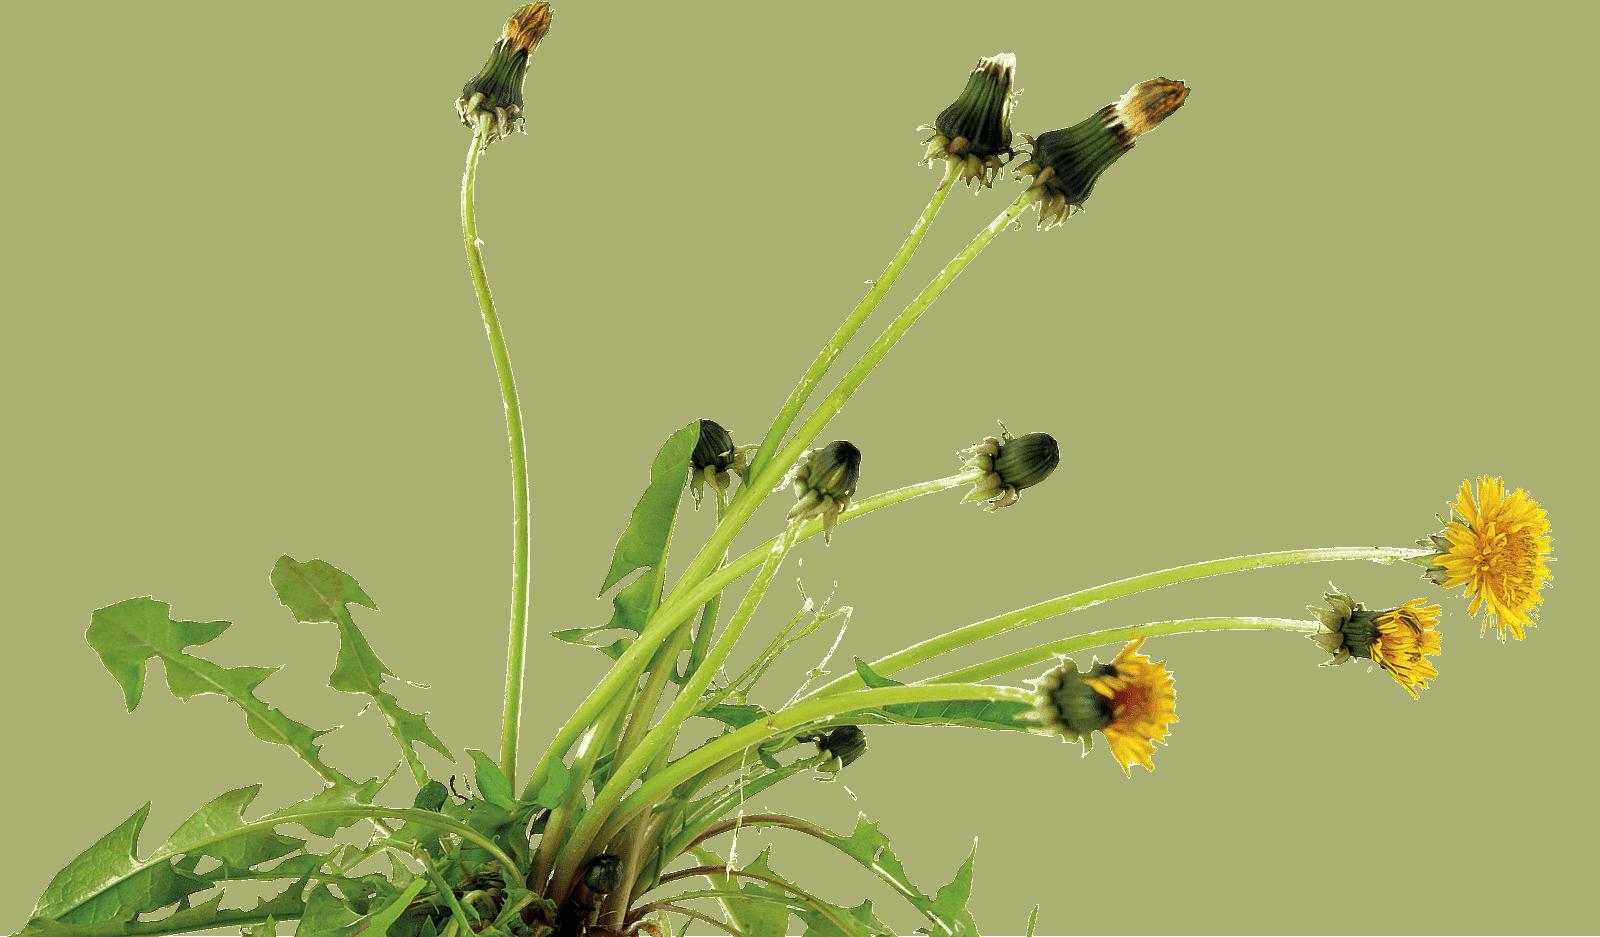 Dandelion-new-pic